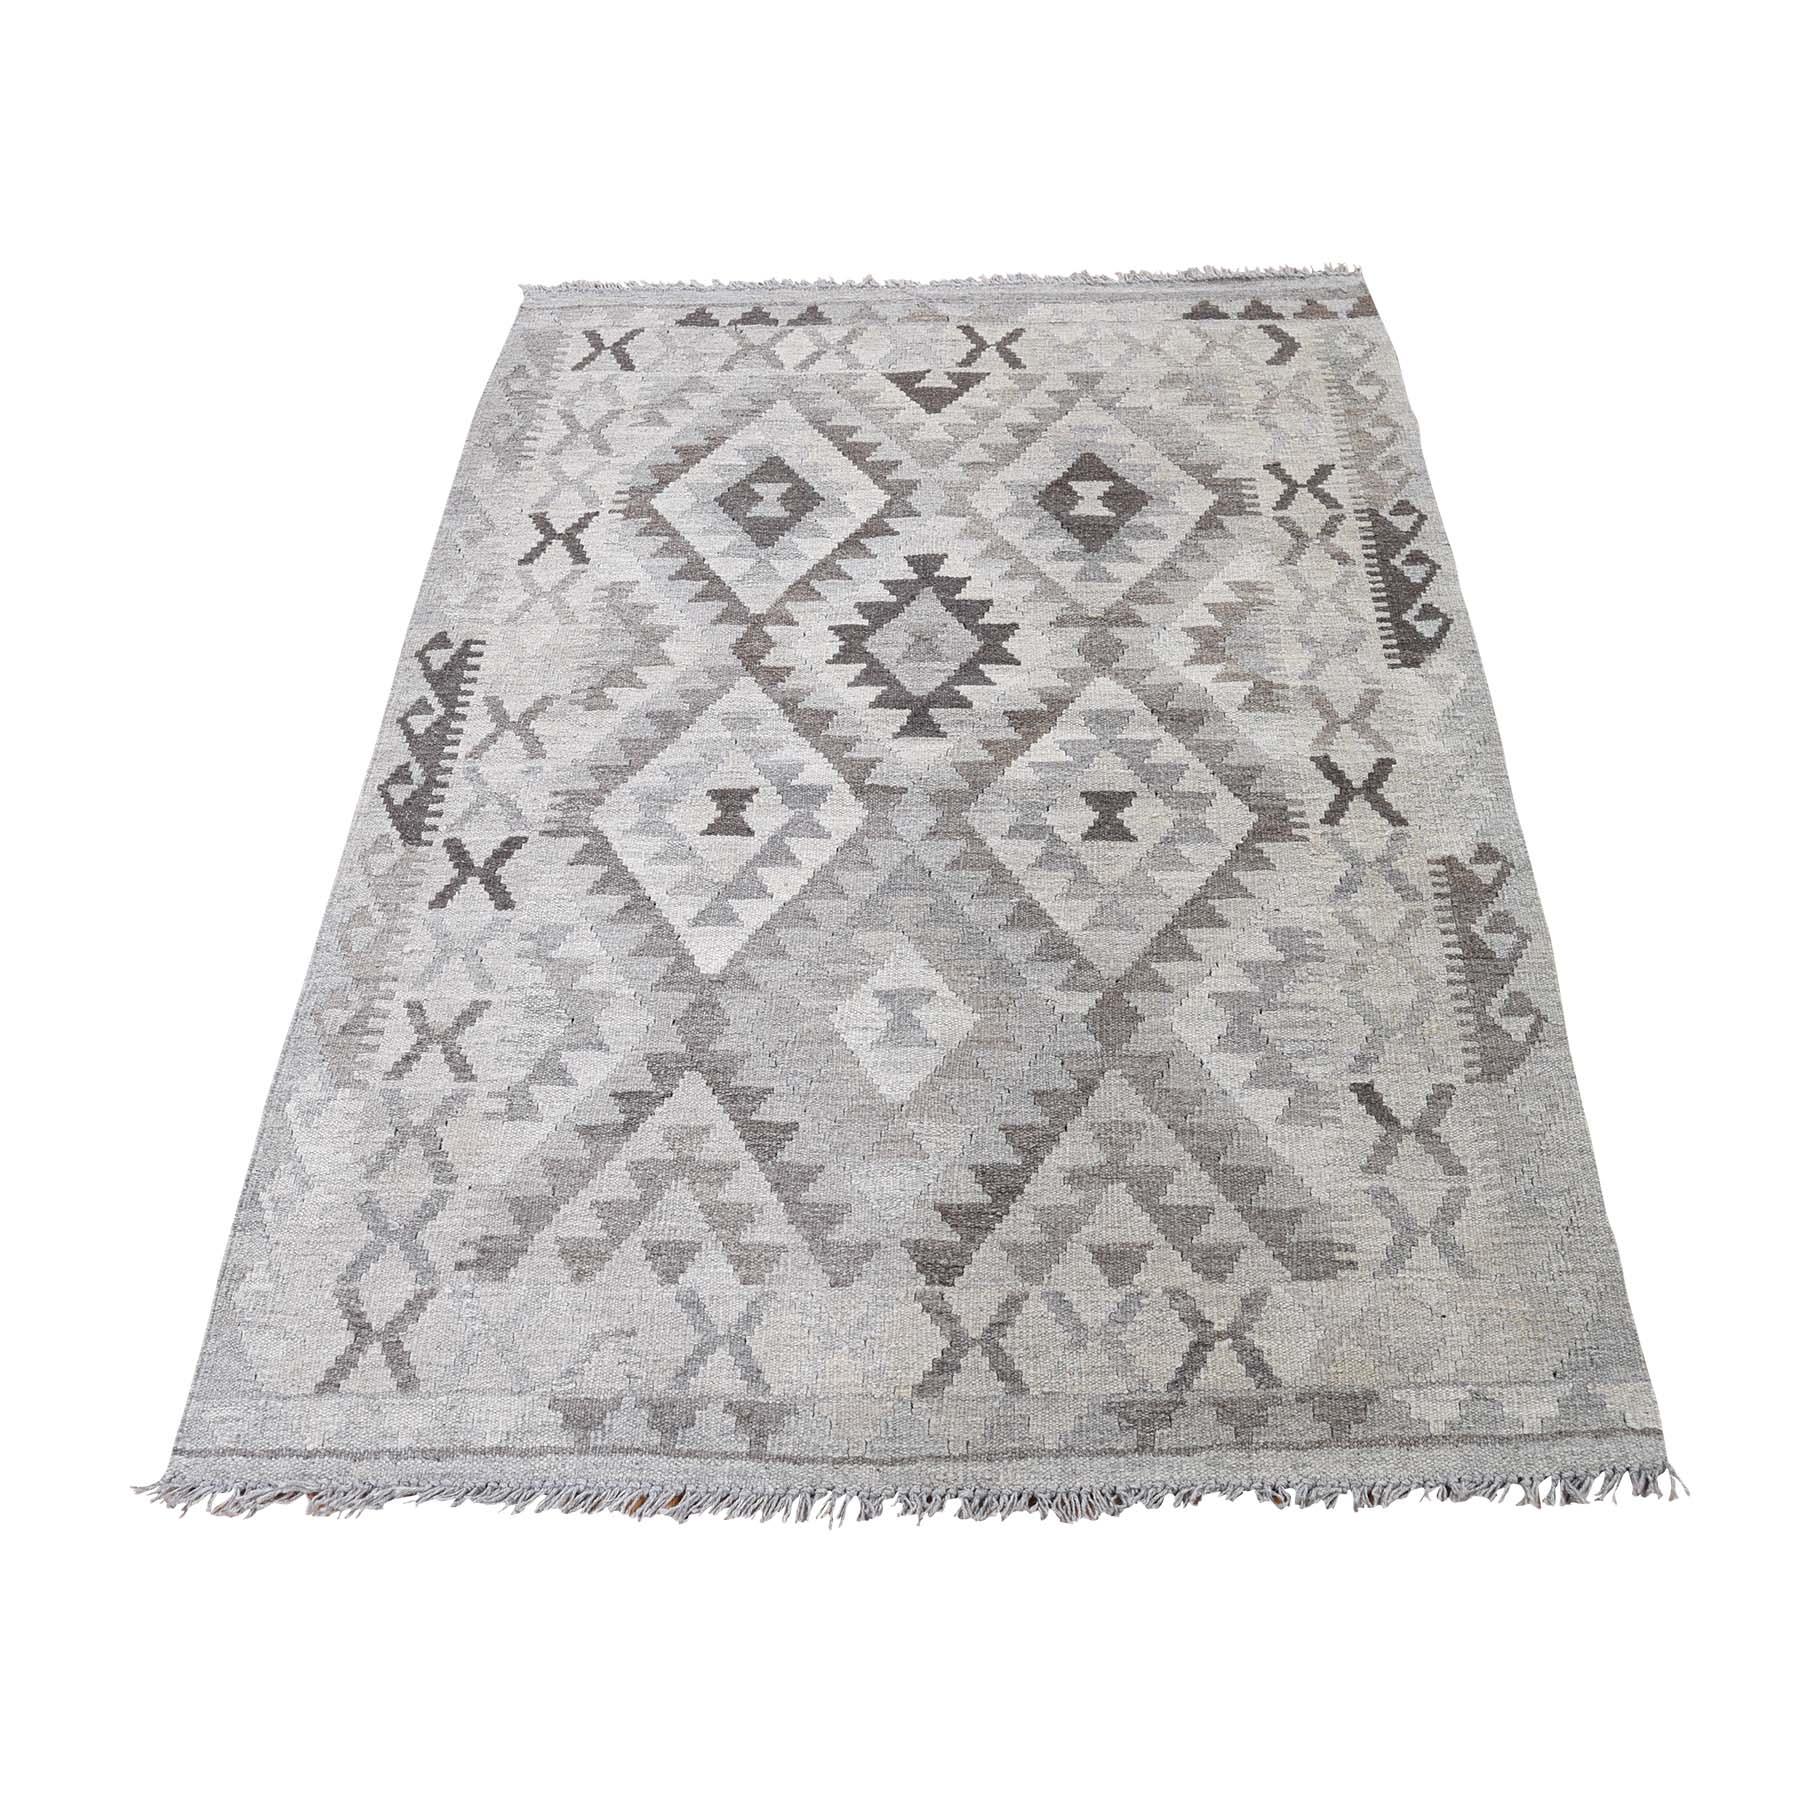 Fine Kilim Collection Hand Woven Grey Rug No: 0189008